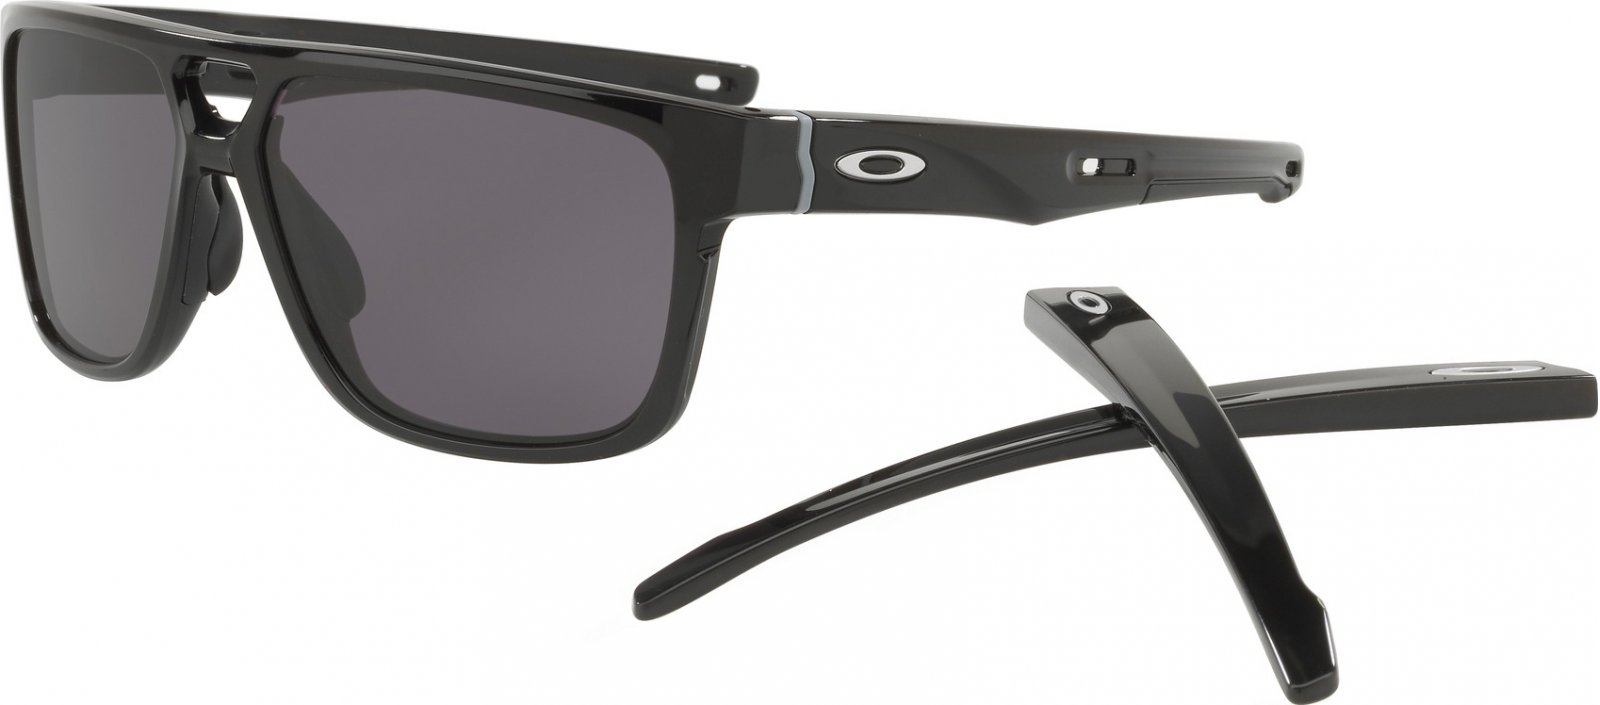 Oakley Crossrange Patch Oo9382-01 Polished Black Warm Grey od 3 499 Kč •  Zboží.cz 70b9aa04c3